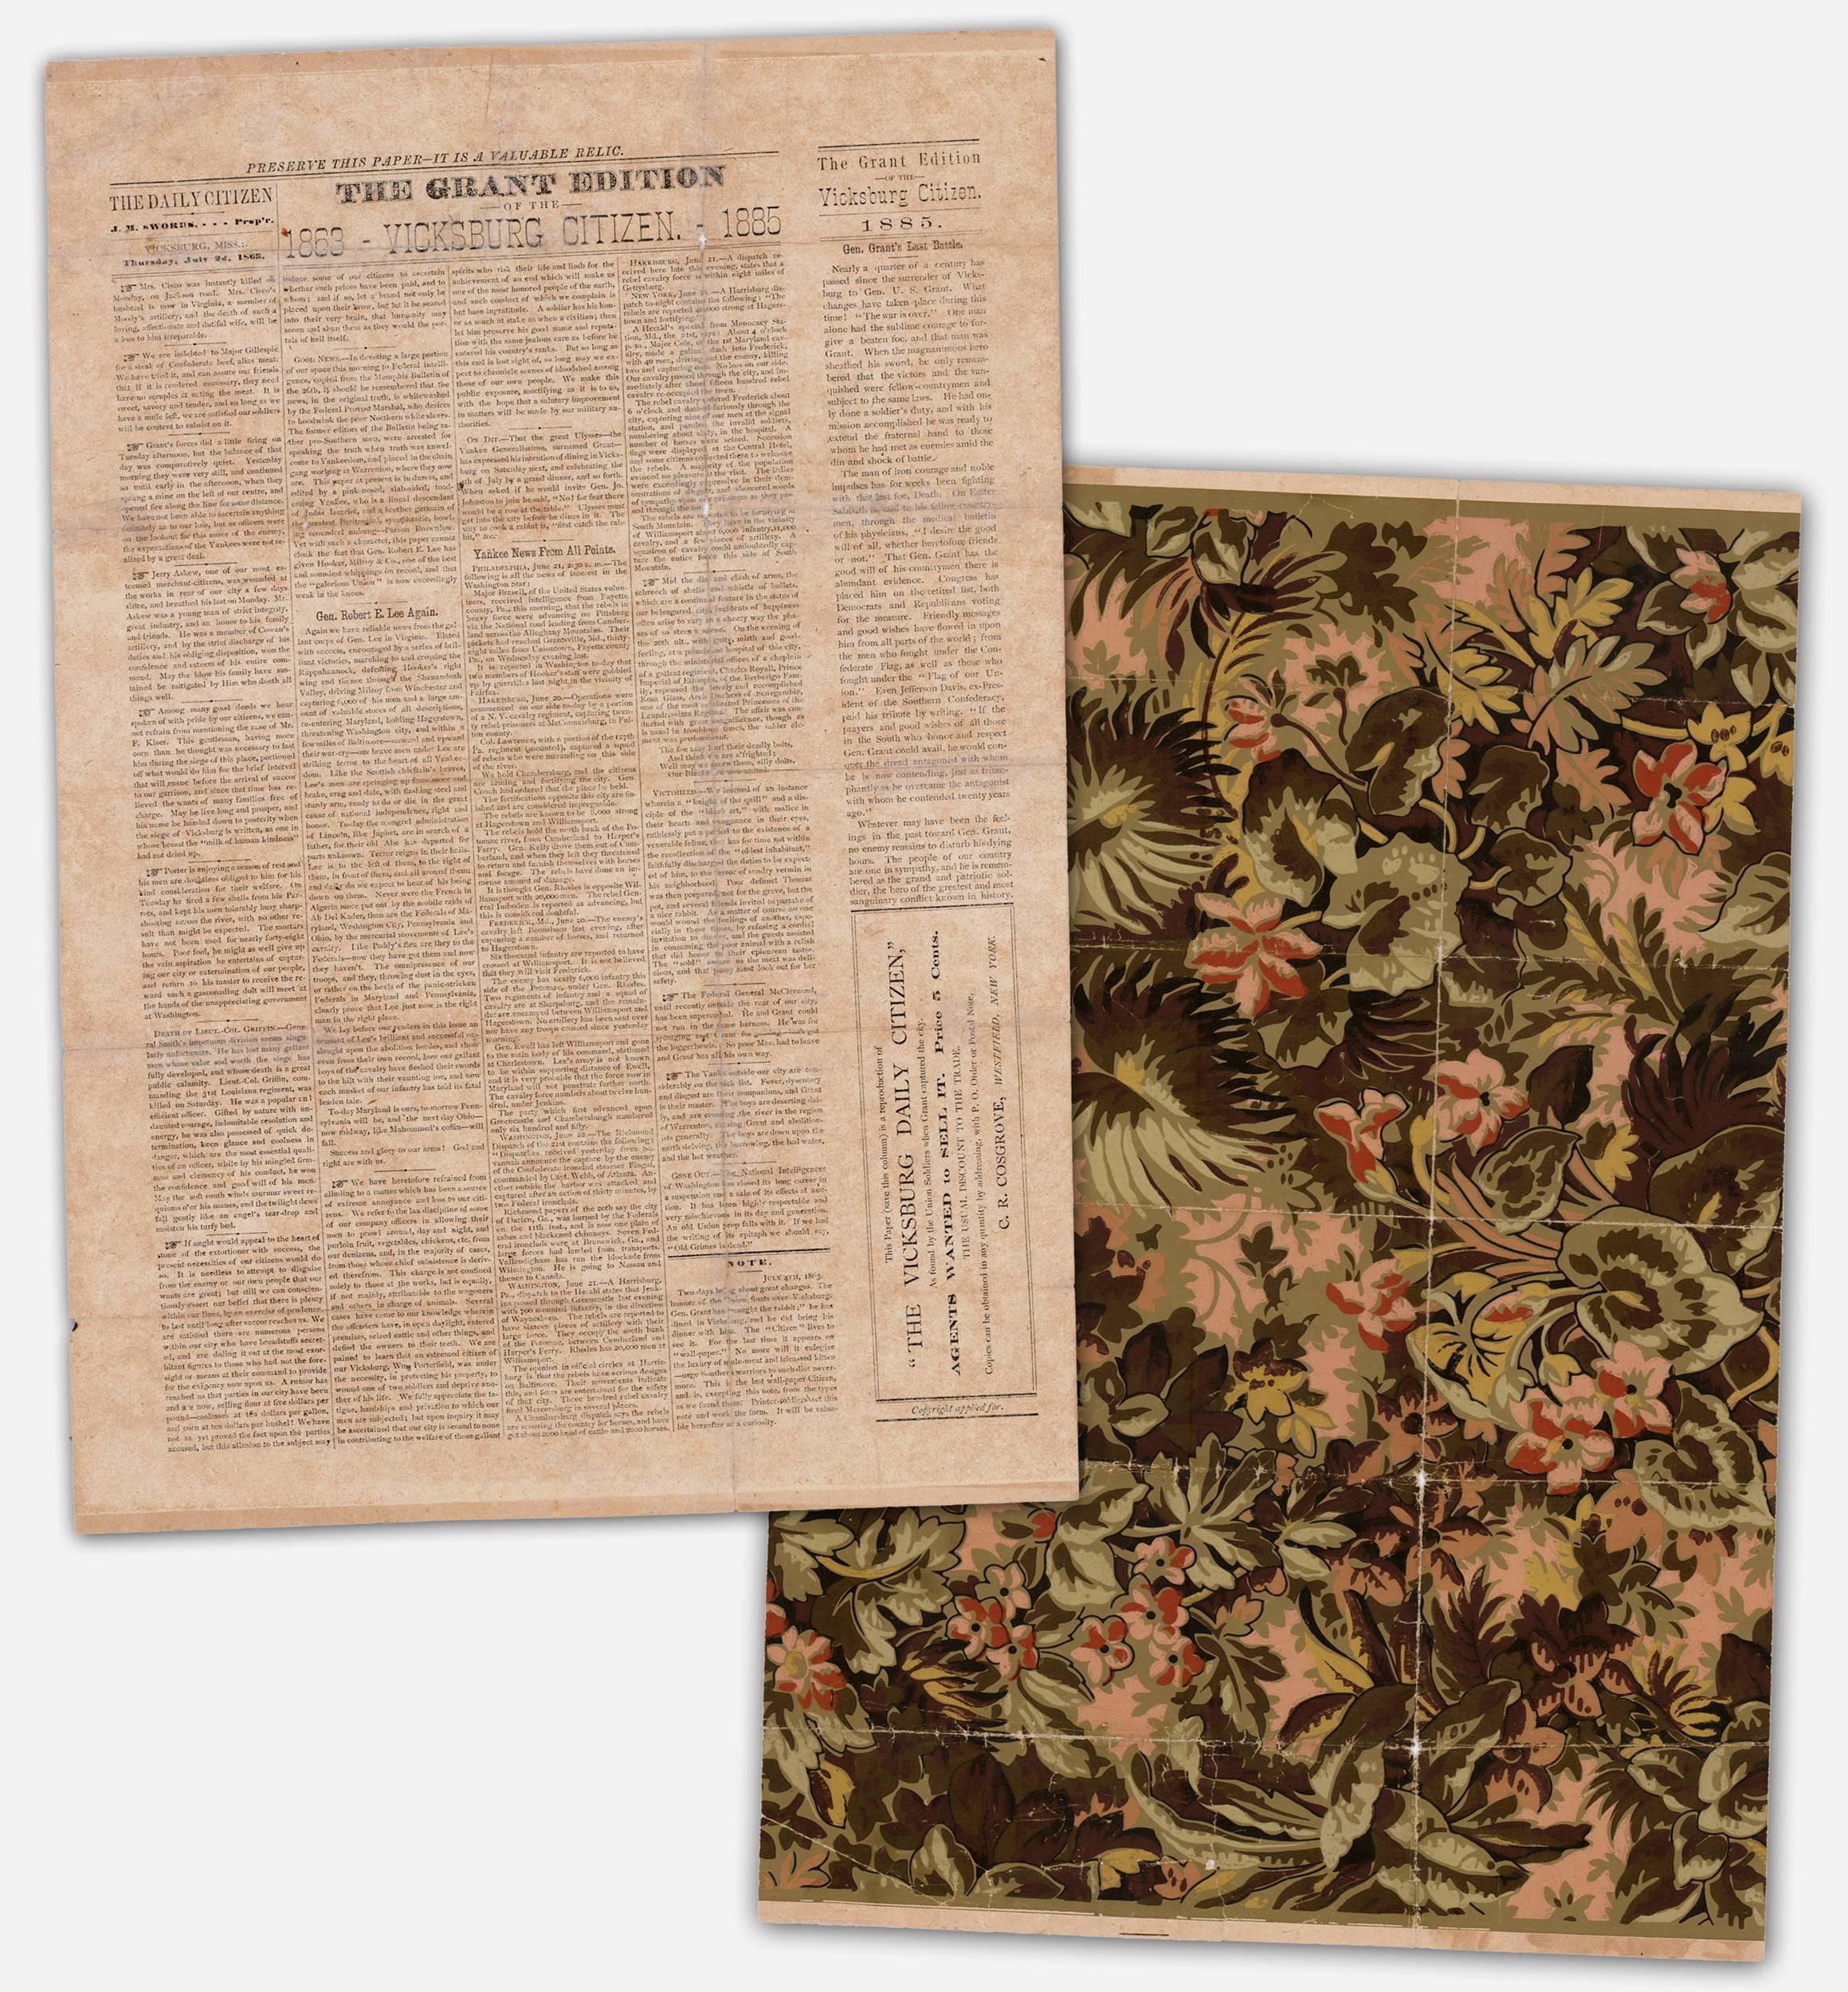 "Grant Edition of ""Vicksburg Daily Citizen"" Wallpaper Newspaper, 1885"